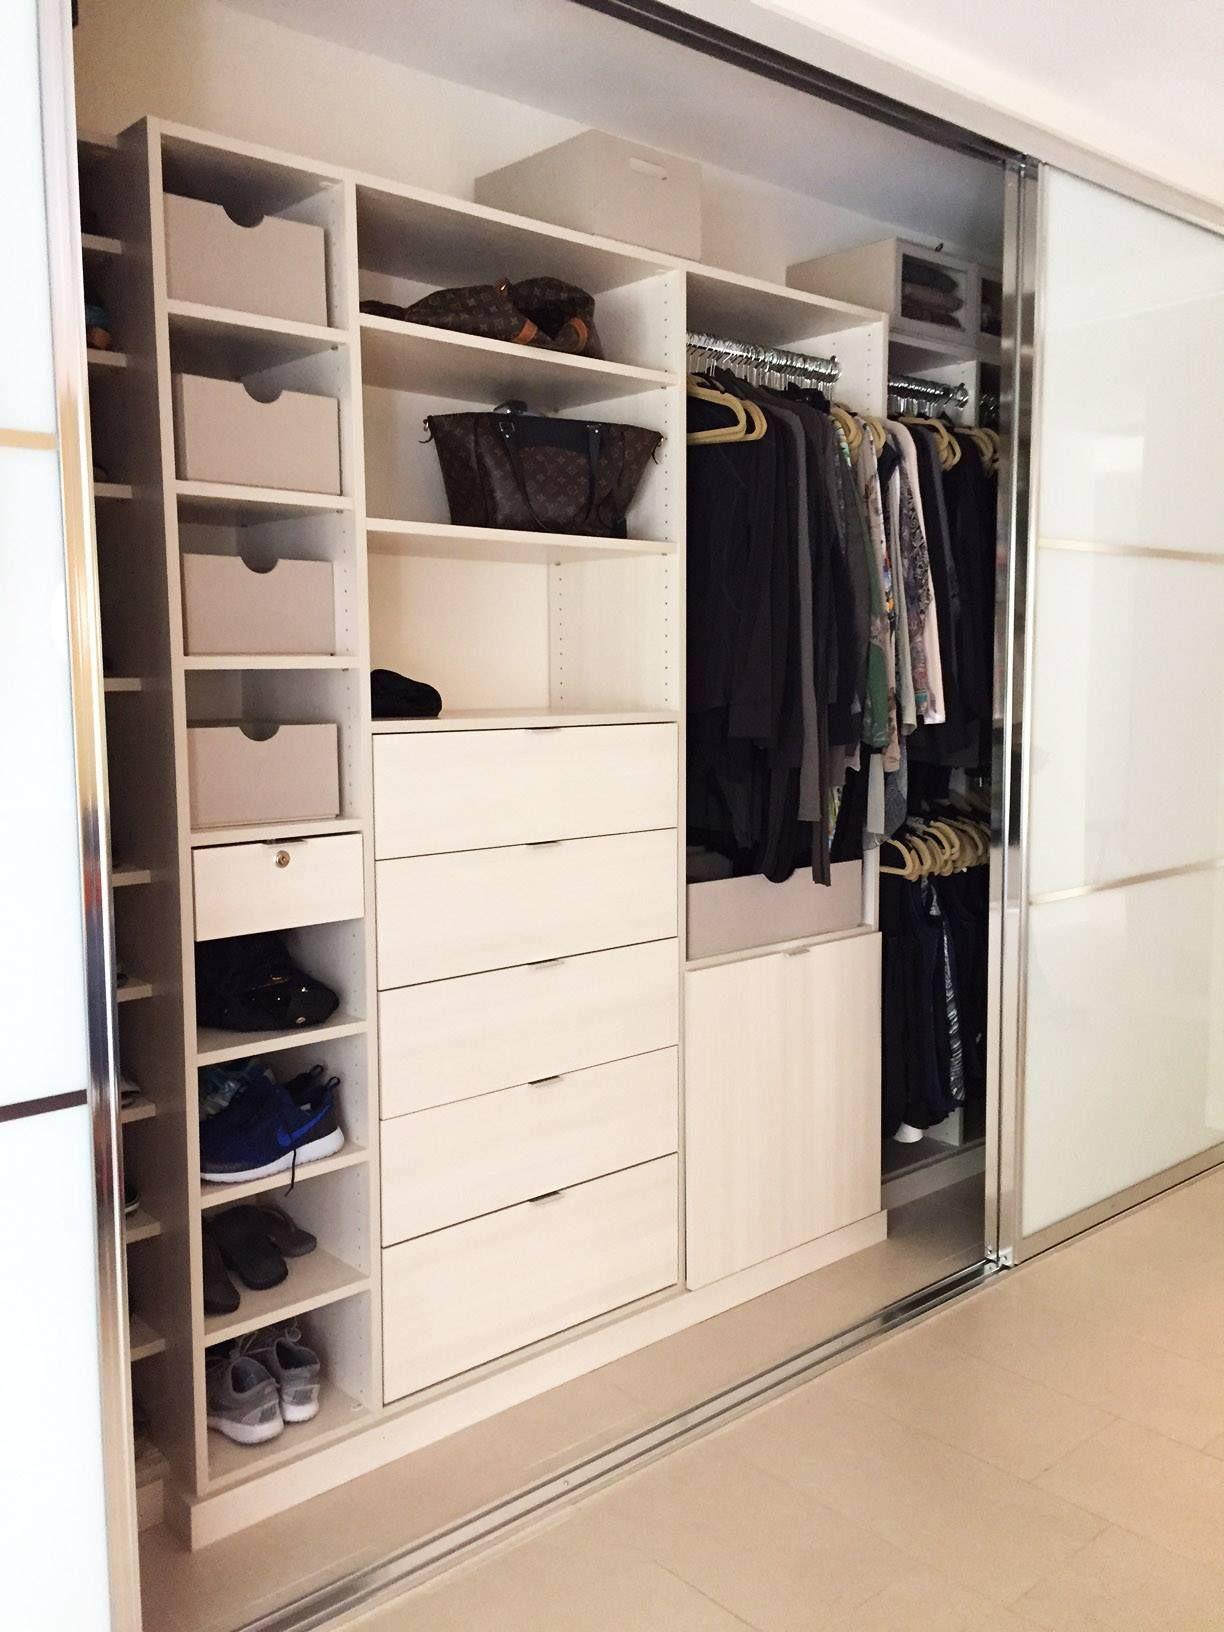 Custom Closets Like This Secret Melamine System Allow You To Maximize Every Inch Of Space Behind Sliding Doo Custom Closets Reach In Closet Closet Organizers